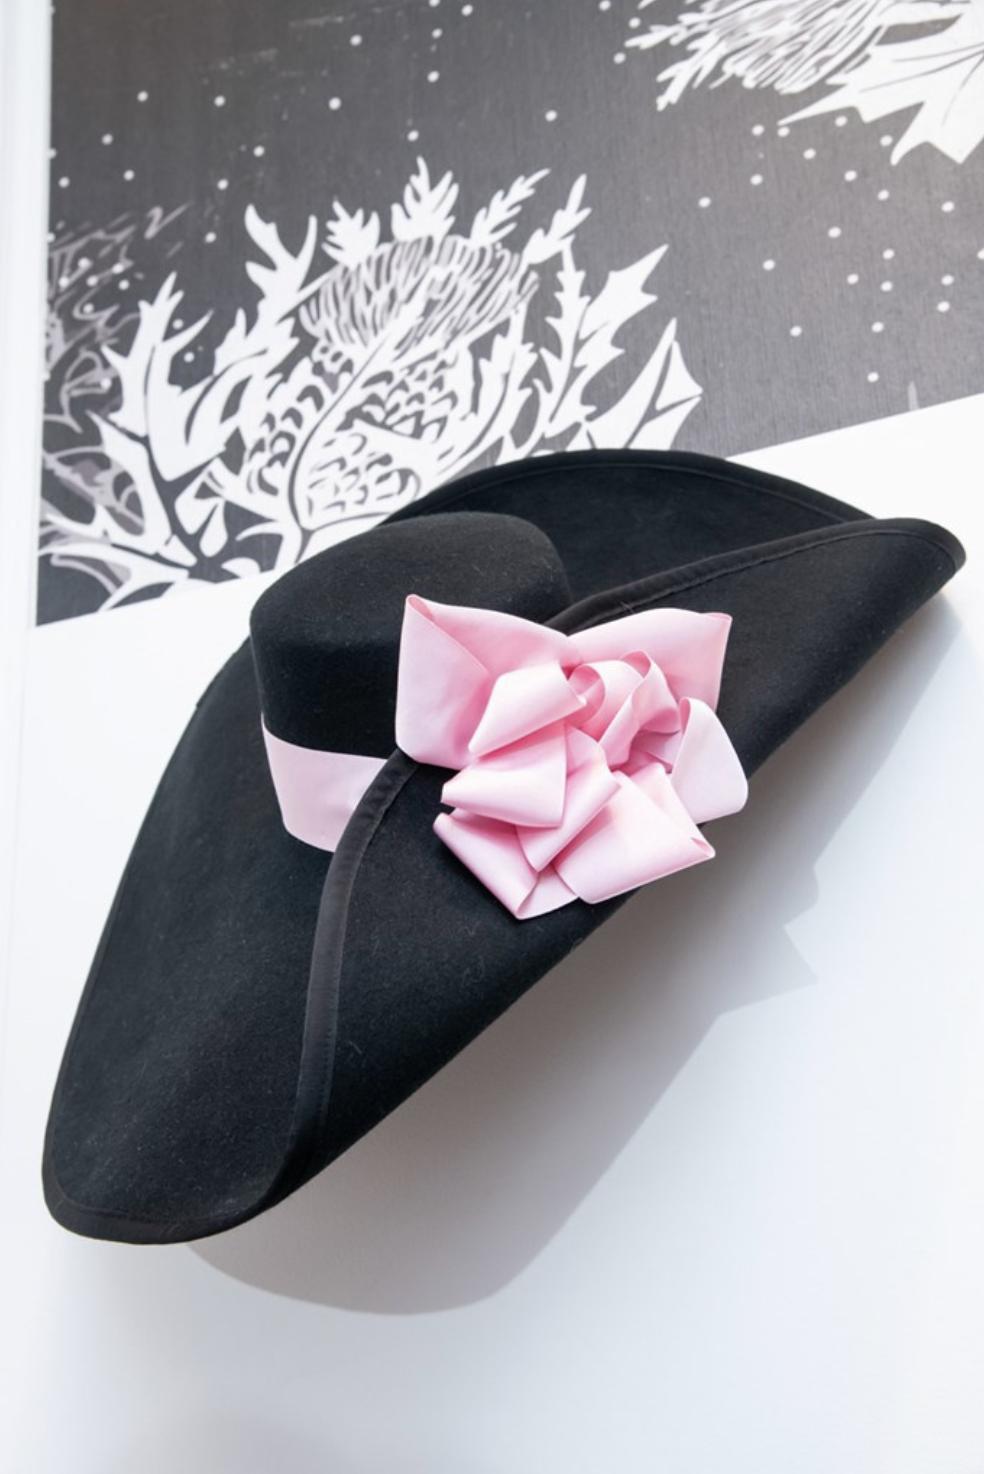 Borsalino's Schiaparelli inspired hand-stitched hat (photo: courtesy Borsalino)